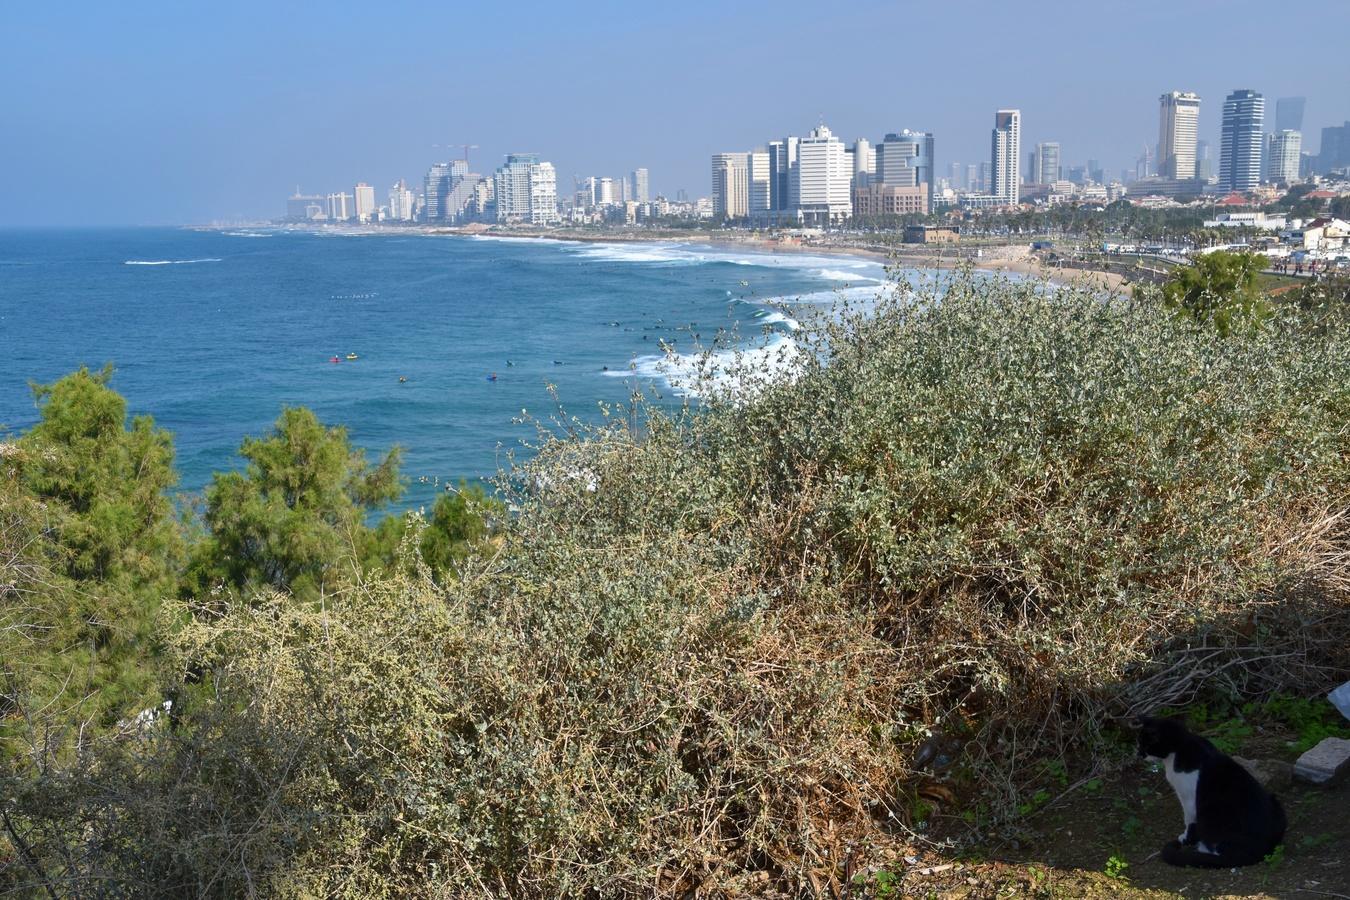 Jaffa v Izraeli